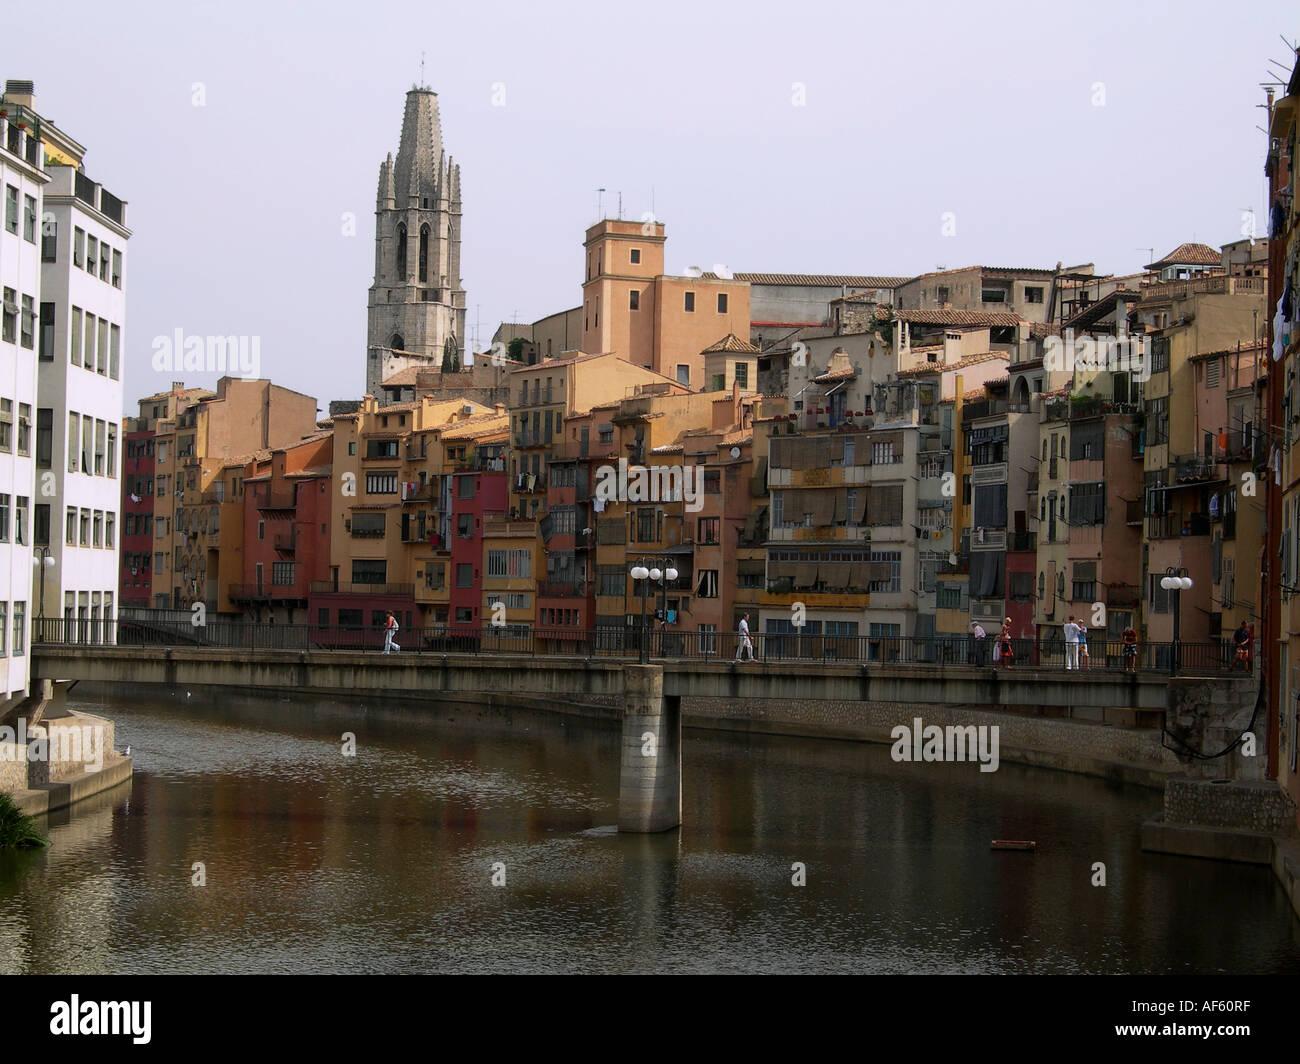 Girona Girona Katalonien Spanien Stadtansicht Stockbild